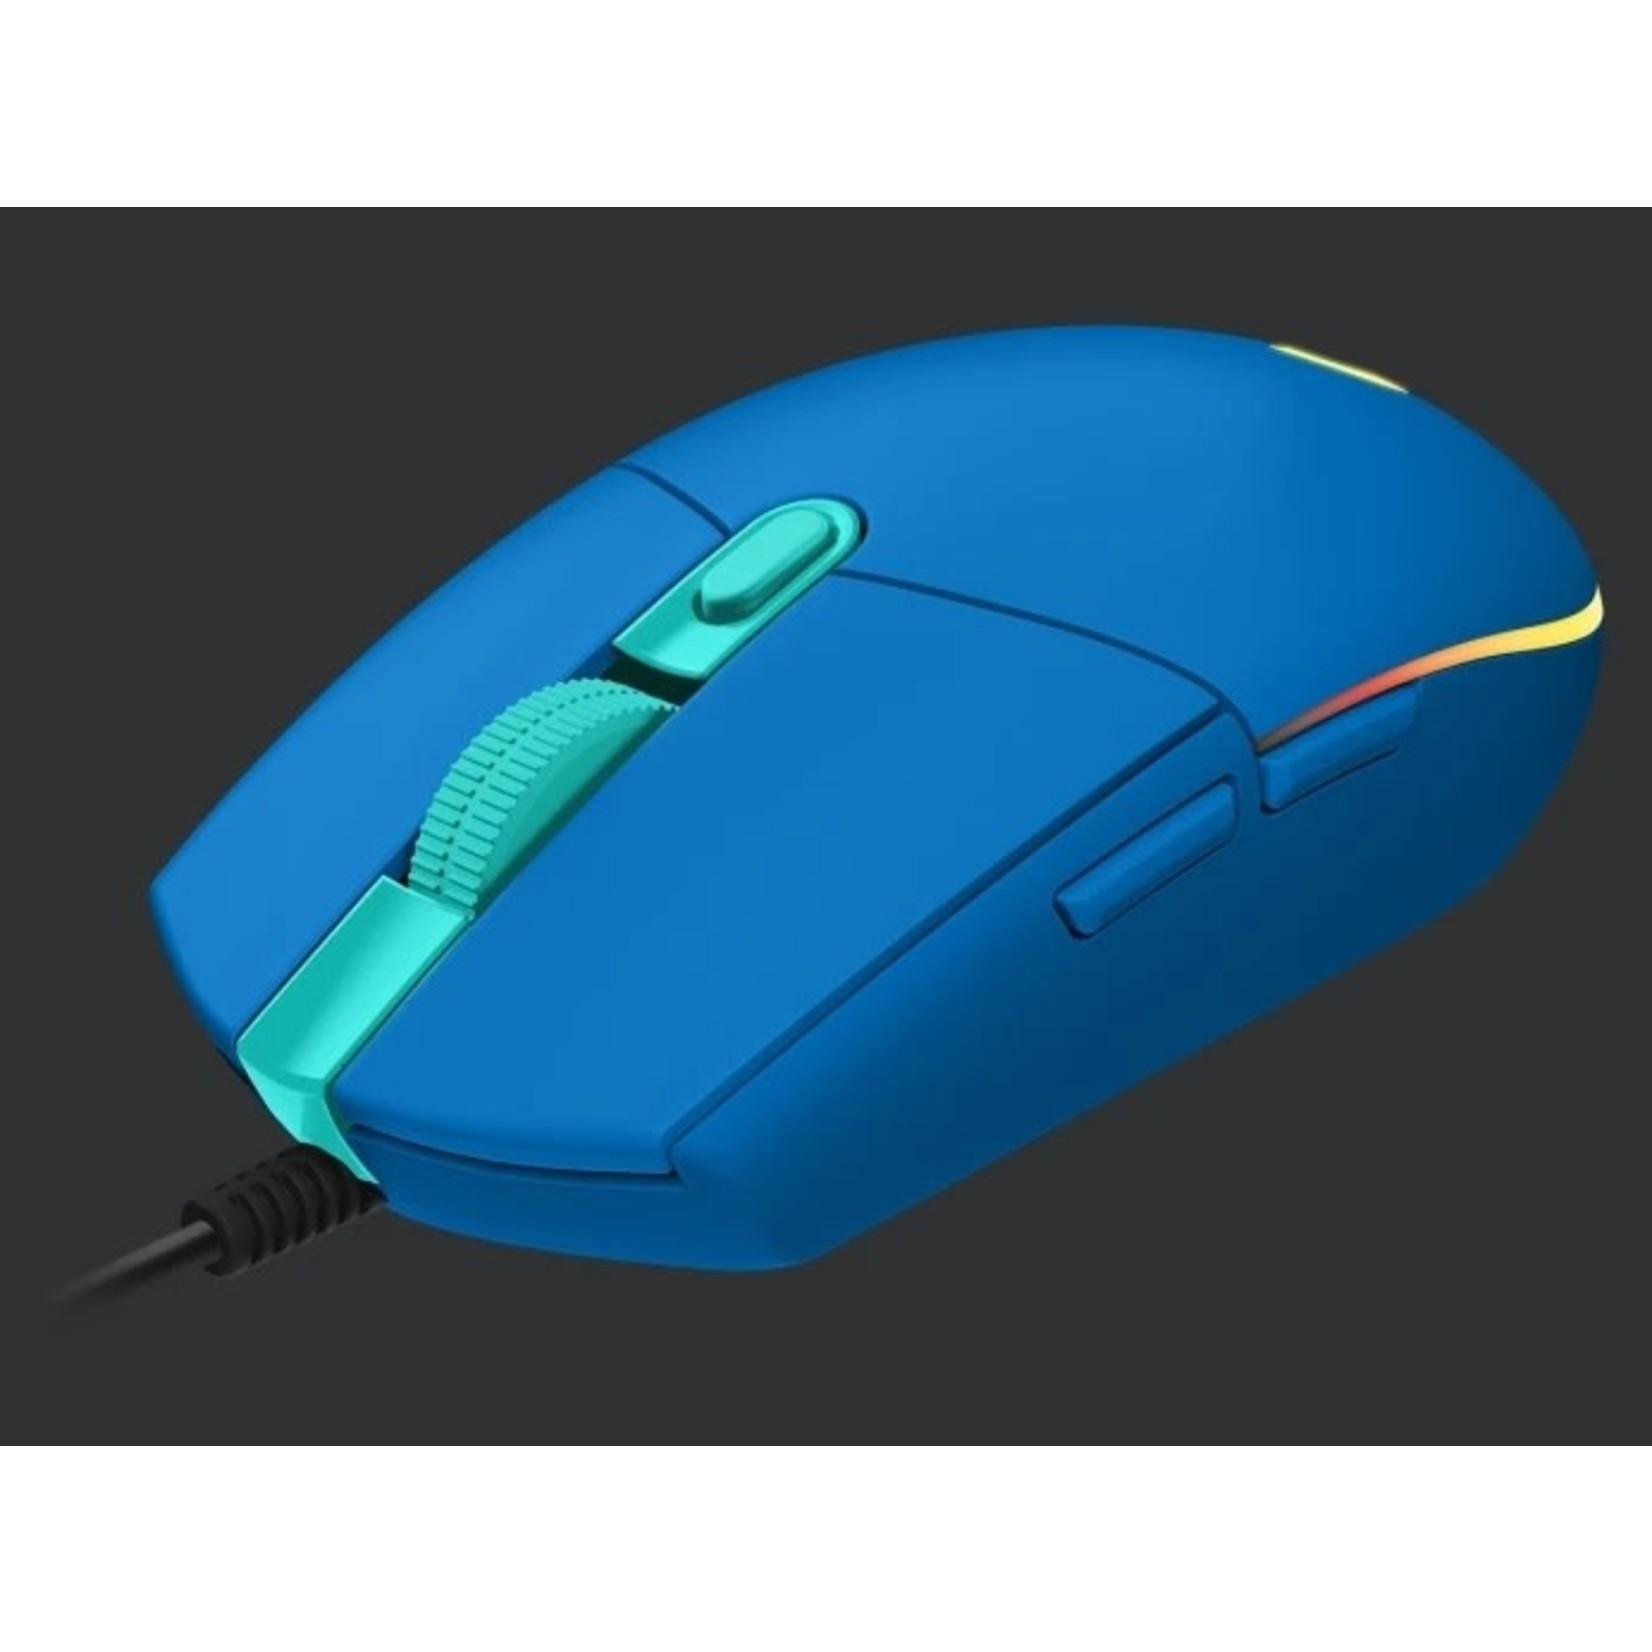 Logitech Logitech G203 Lightsync Gaming Mouse Blue